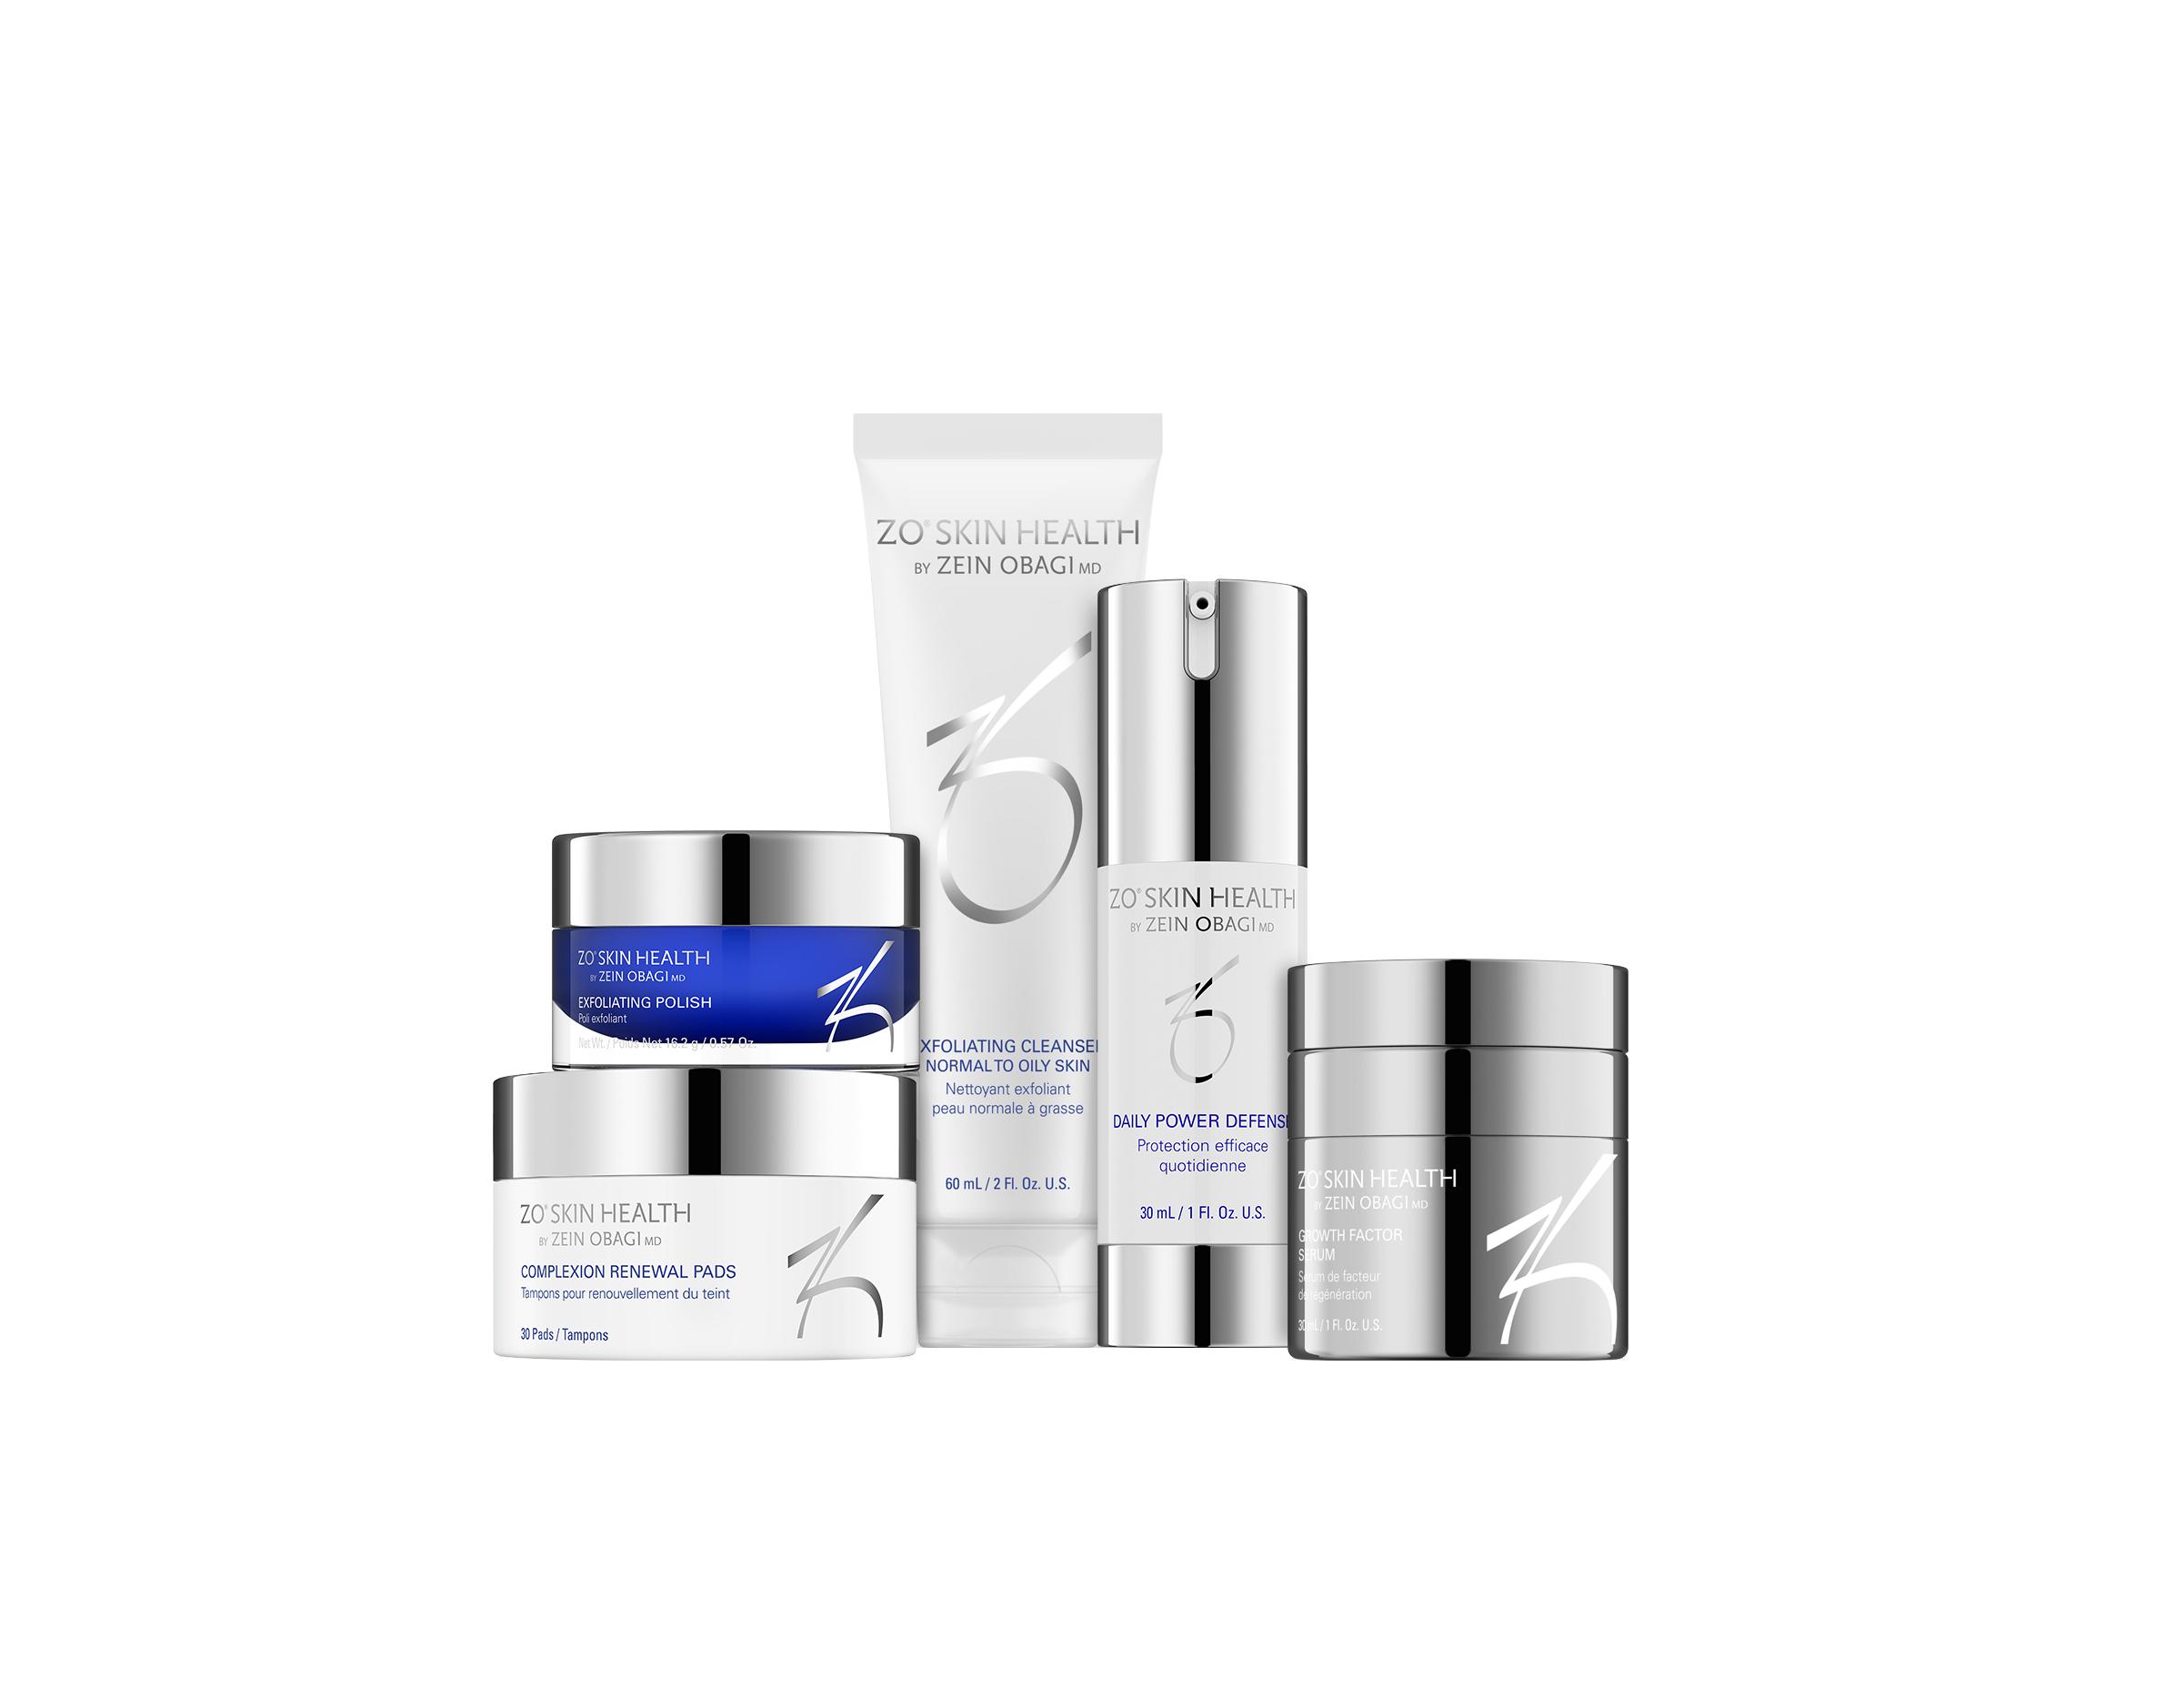 ZO Skin Health Anti-Aging Products